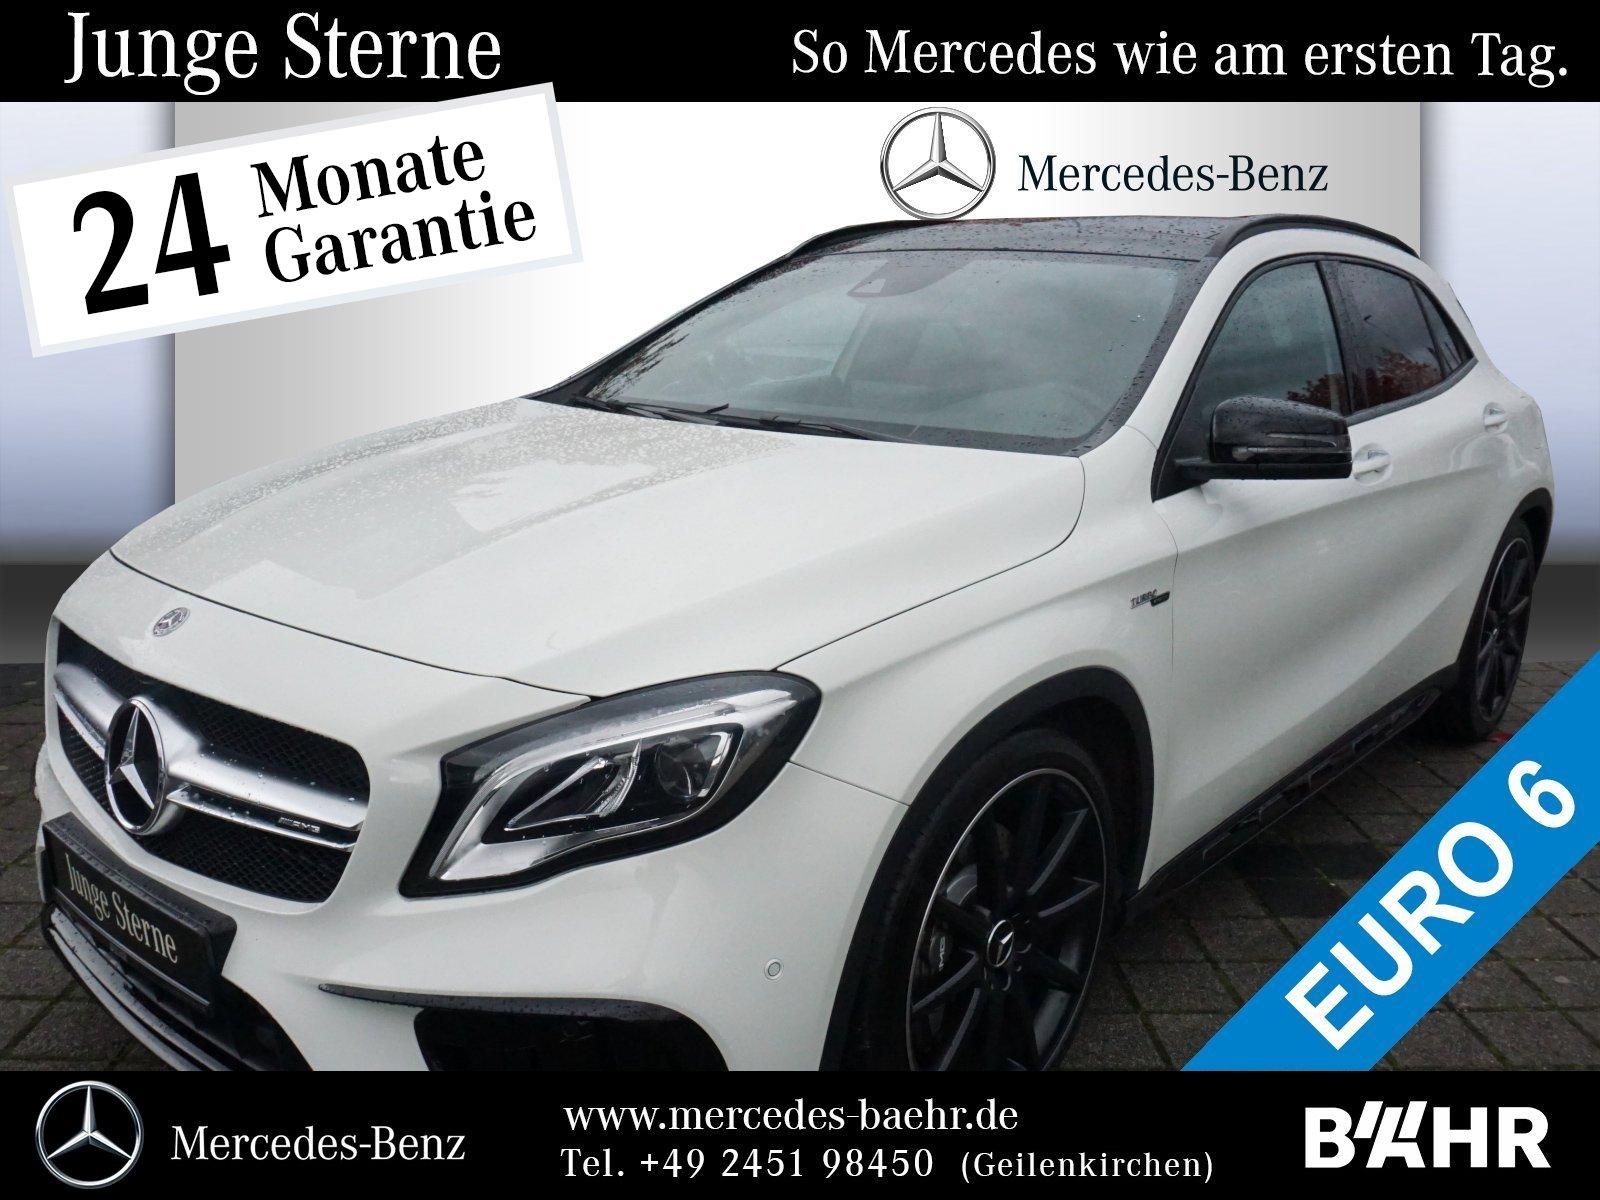 Mercedes-Benz GLA 45 AMG 4M Night/Comand/LED/Driver'sPackage, Jahr 2017, petrol